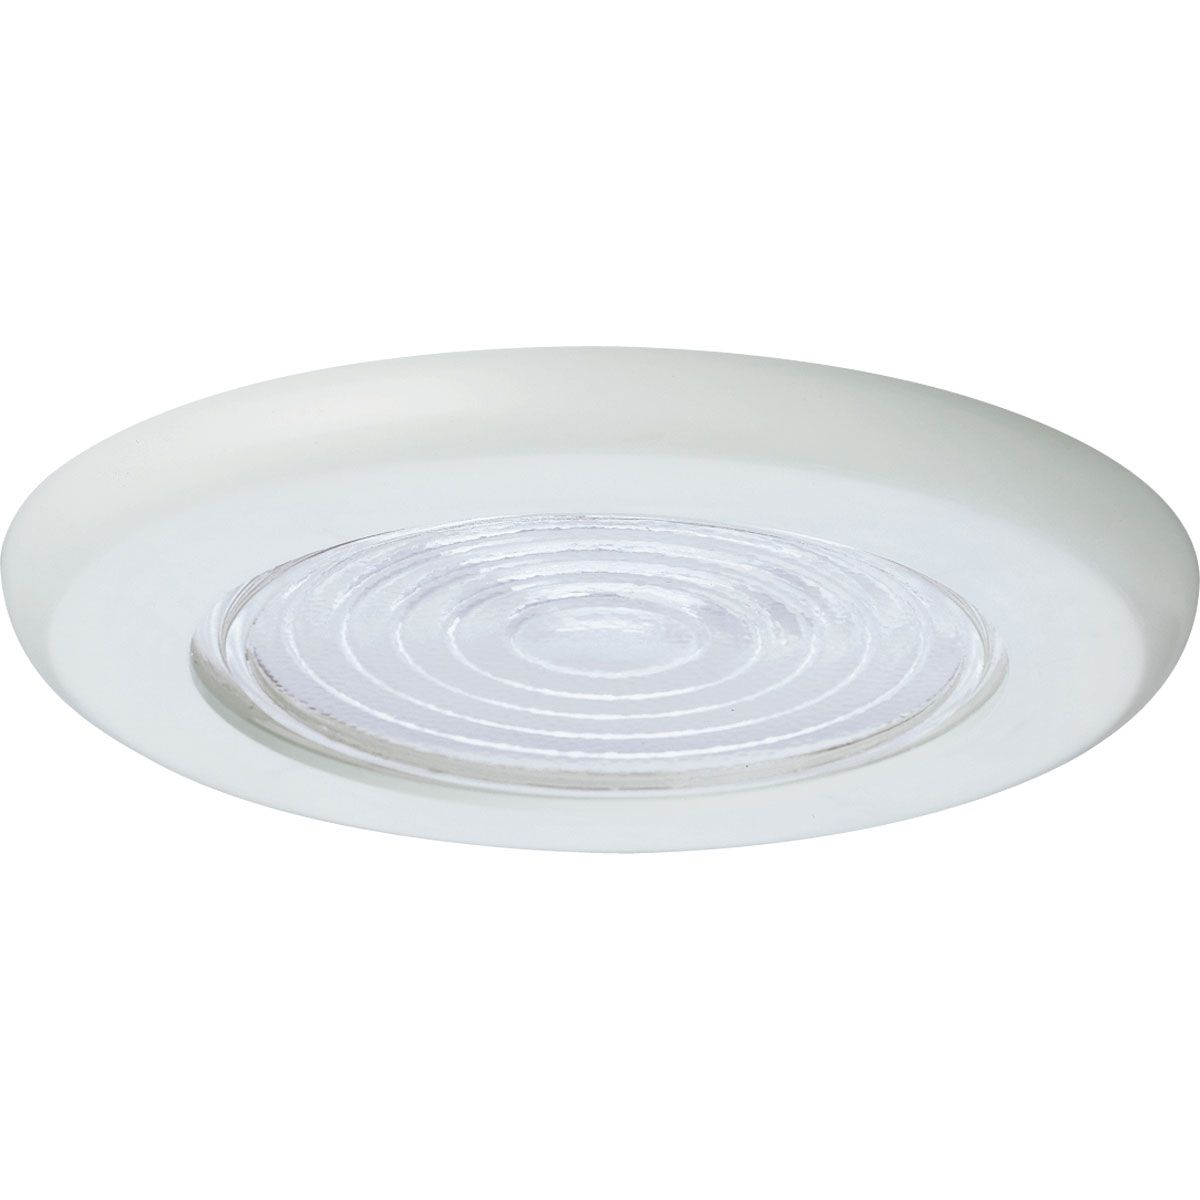 PROP8011-60 FRESNEL LENS; WHITE; 6 INCH NOMINAL APERTURE SIZE; ROUND APERTURE SHAPE; PAR30-50/75 W INCANDESCENT LAMP; APPLICATION DAMP/WET LOCATION; USED ON P87-AT/P187-TG SERIES, PROGRESS